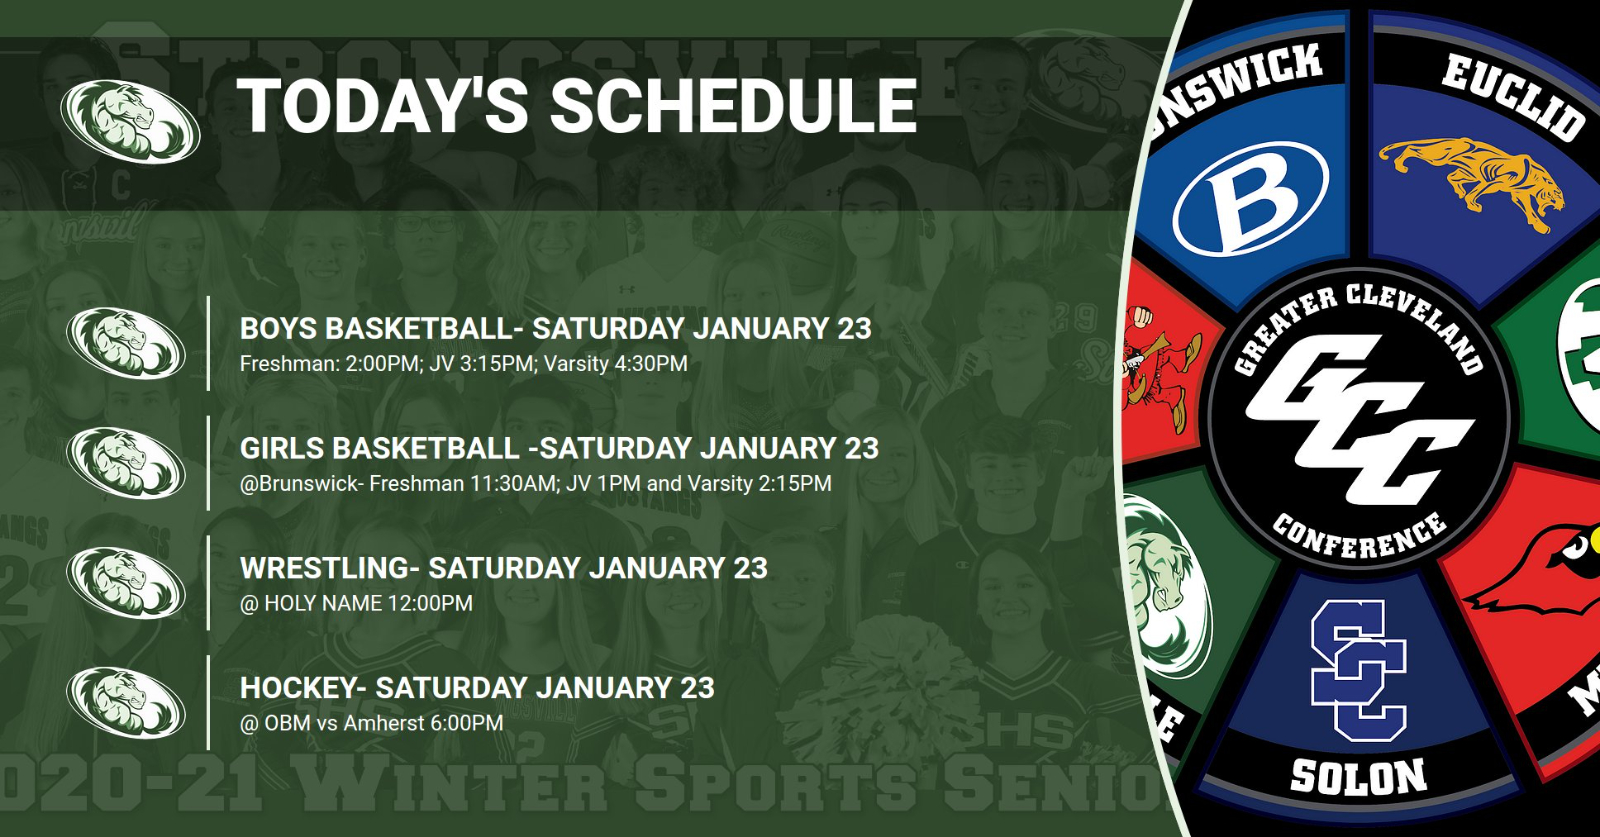 Saturday January 23, 2021 schedule